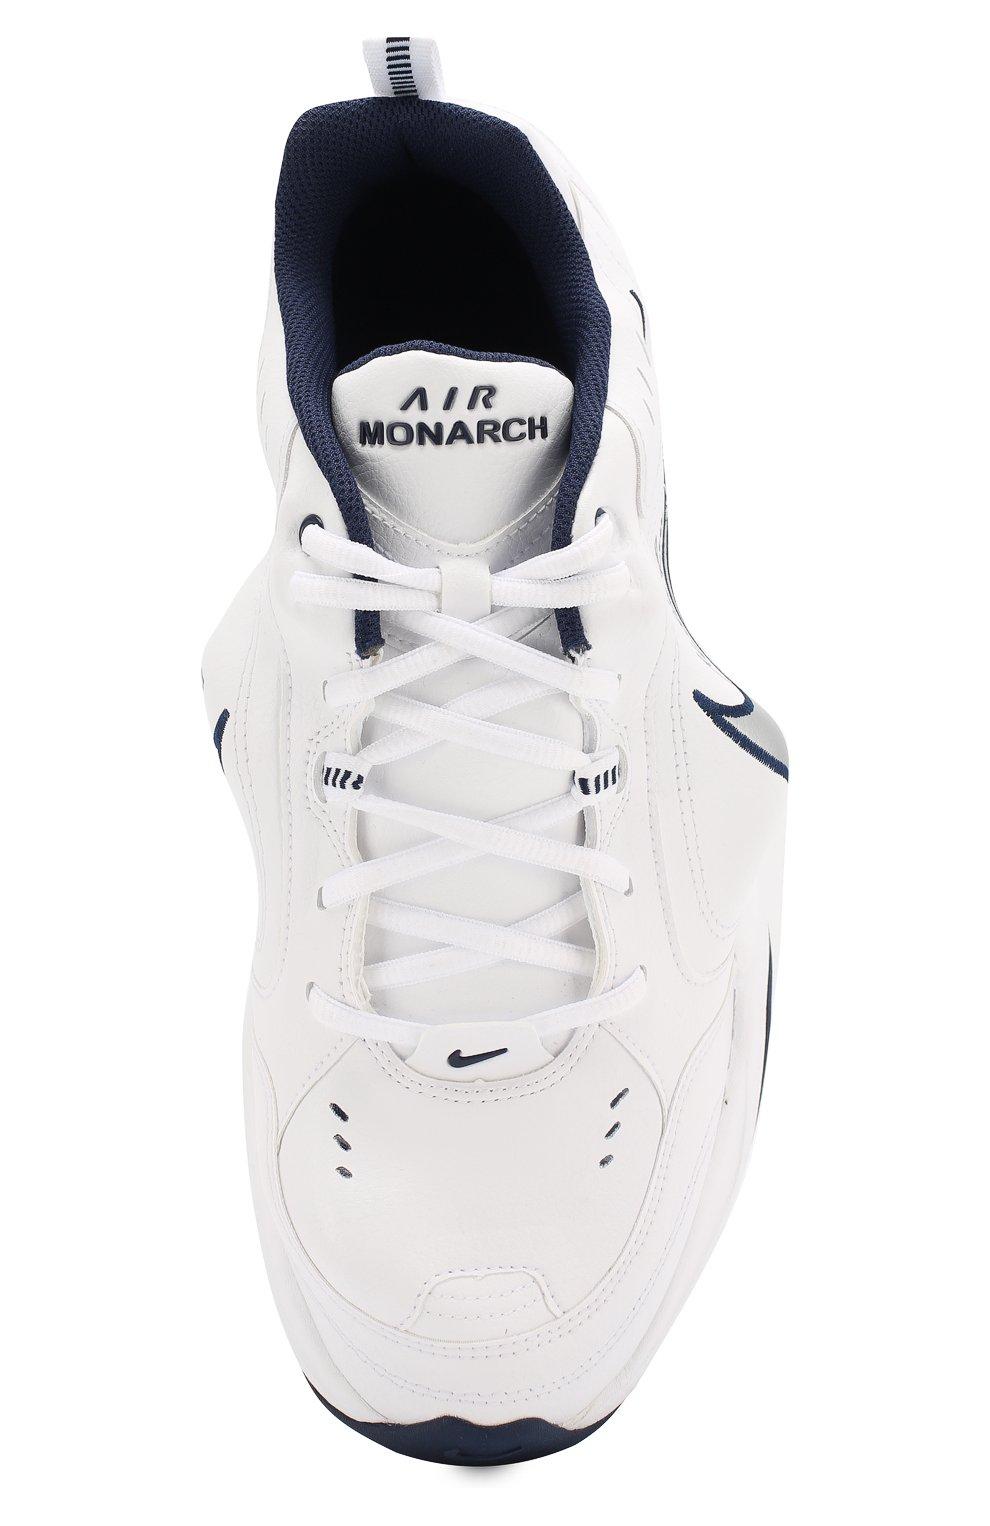 3d9ea42dc Кожаные кроссовки NikeLab x Martine Rose Air Monarch IV NikeLab белые |  Фото №5